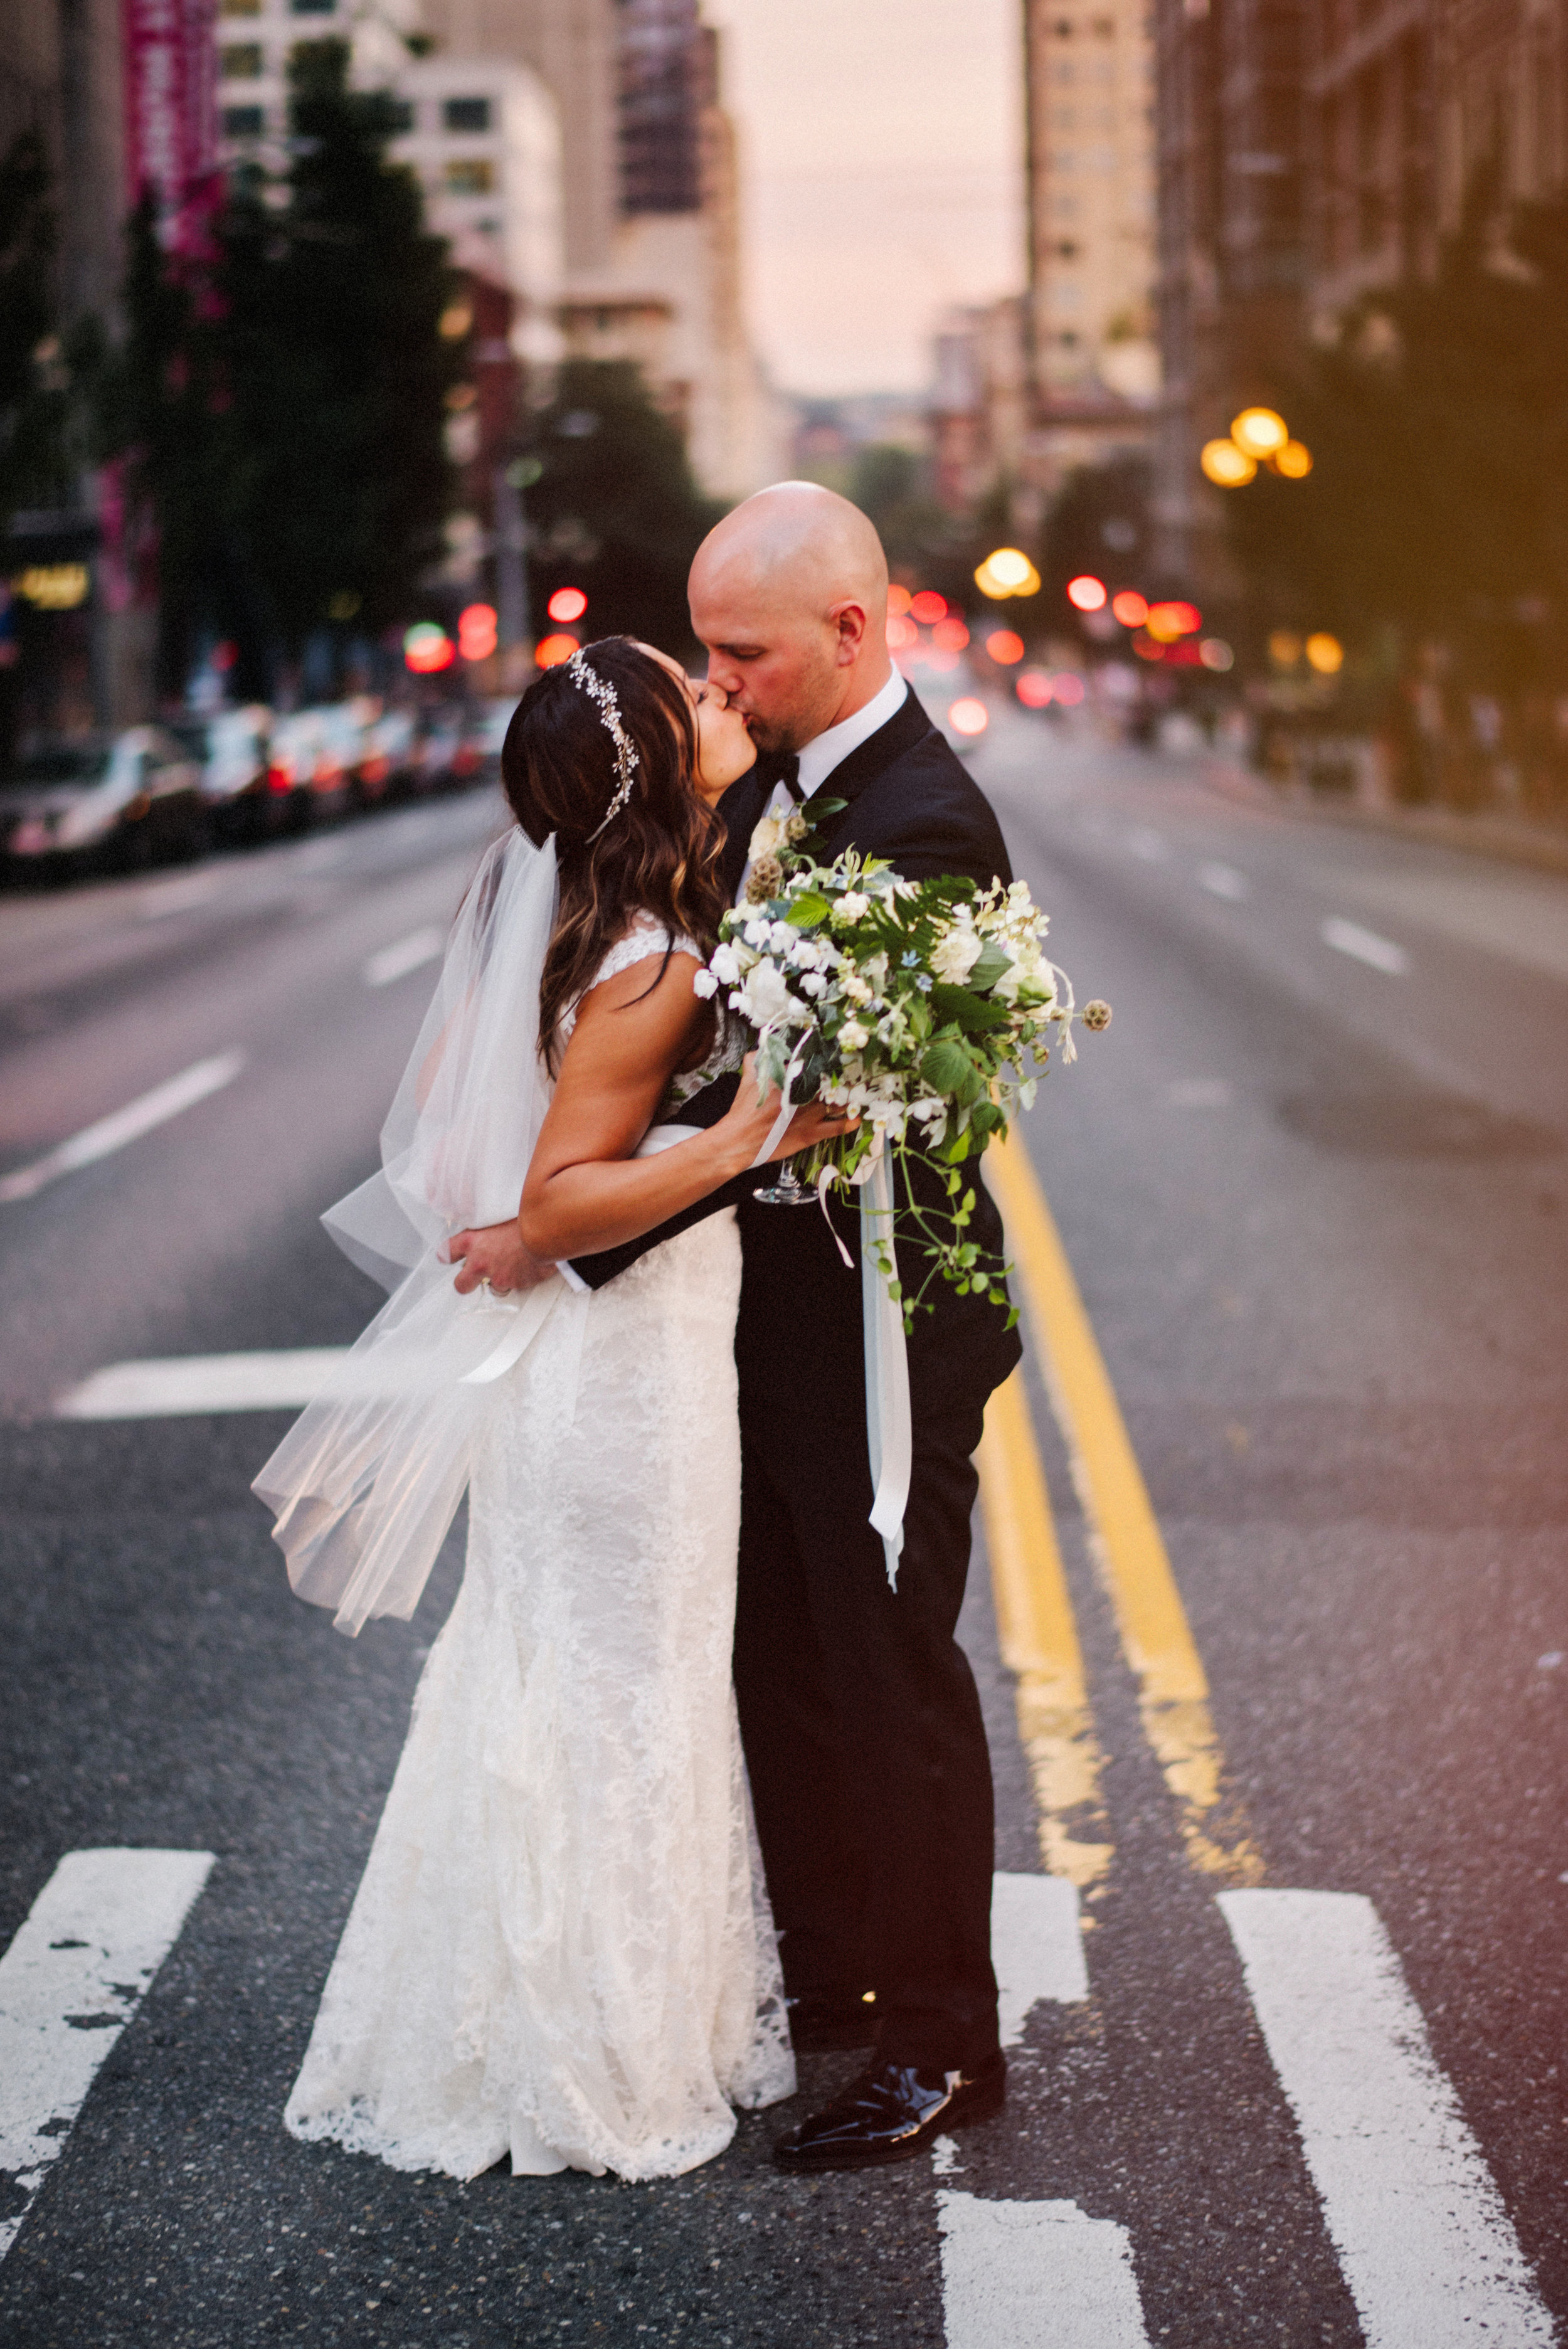 erintommy-four-seasons-seattle-wedding-ryan-flynn-photography-portraits-0063.JPG